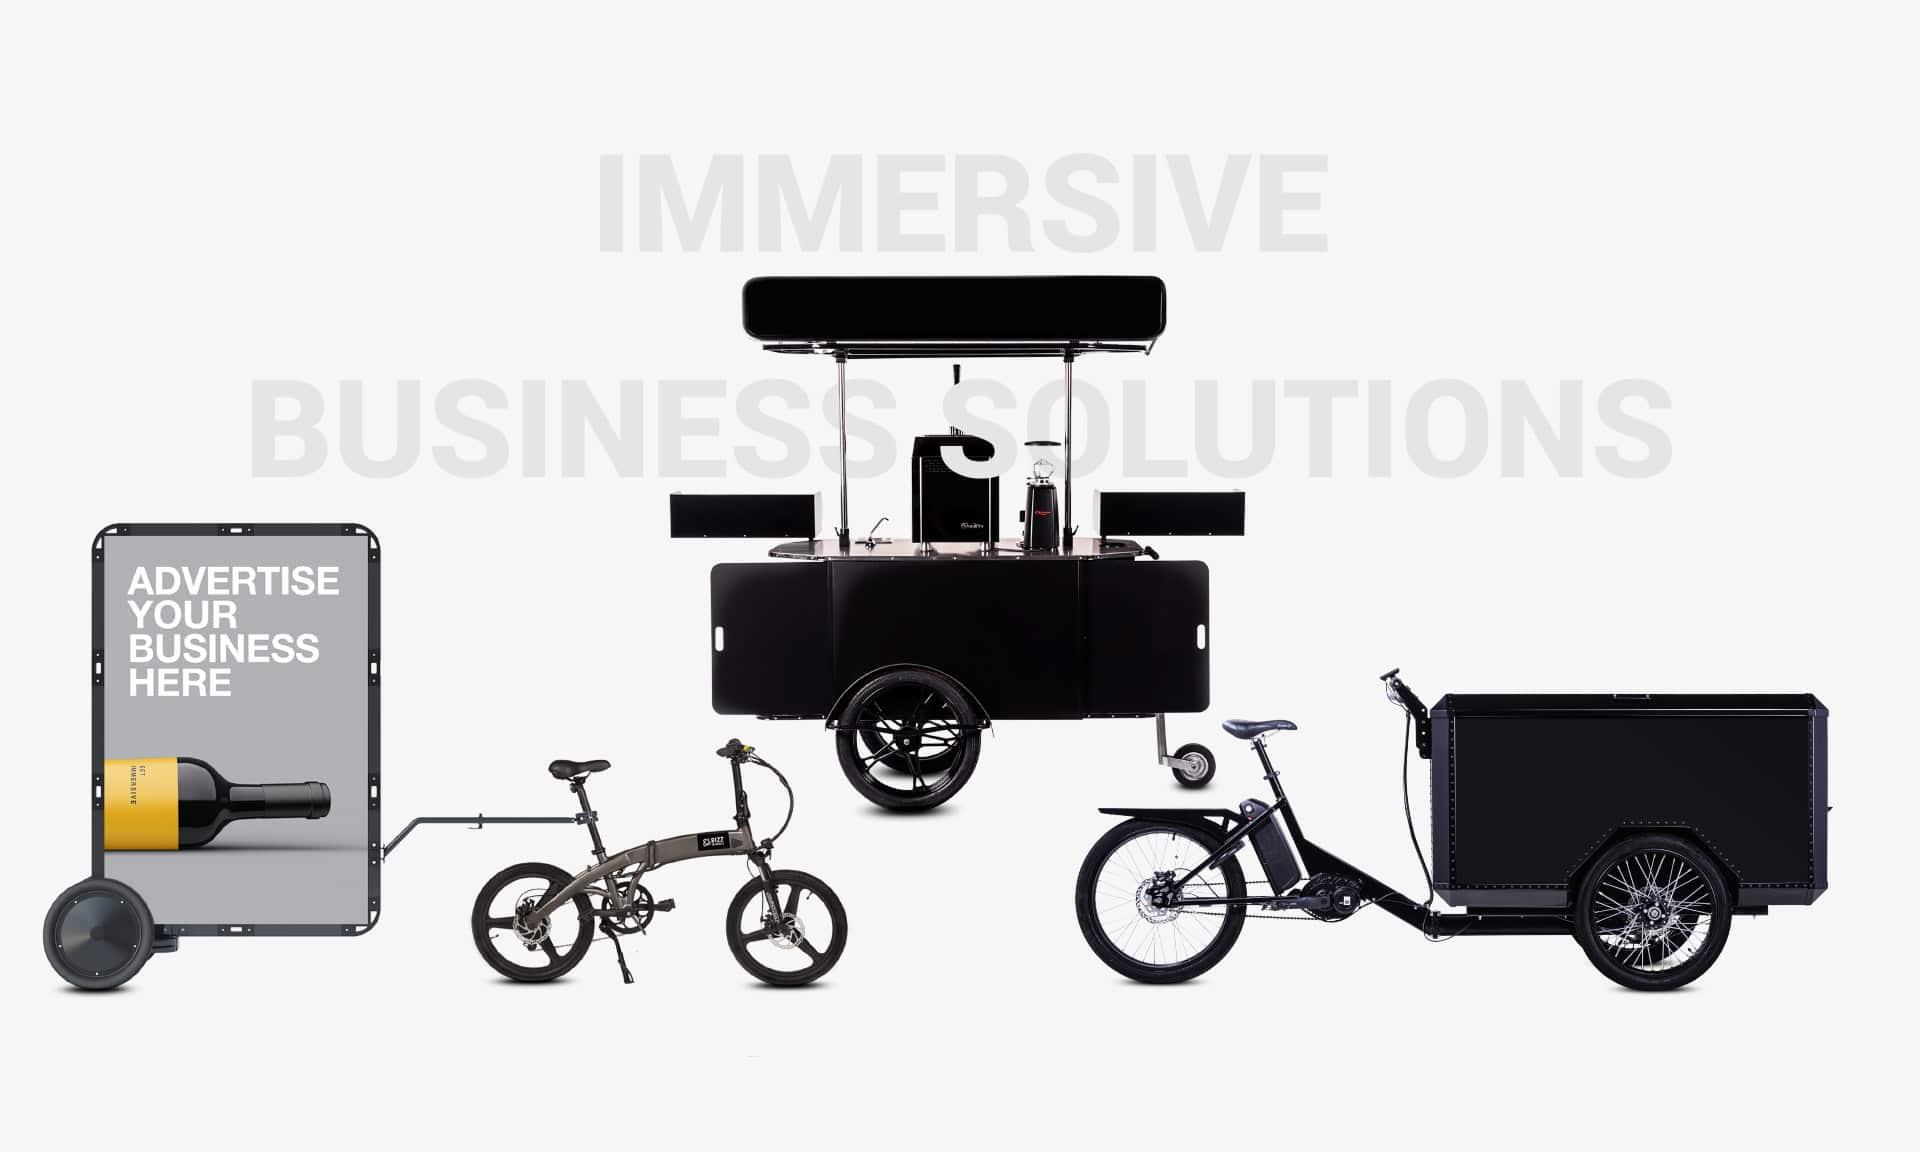 Food carts cargo bike and mobile billboards Bizz On Wheels